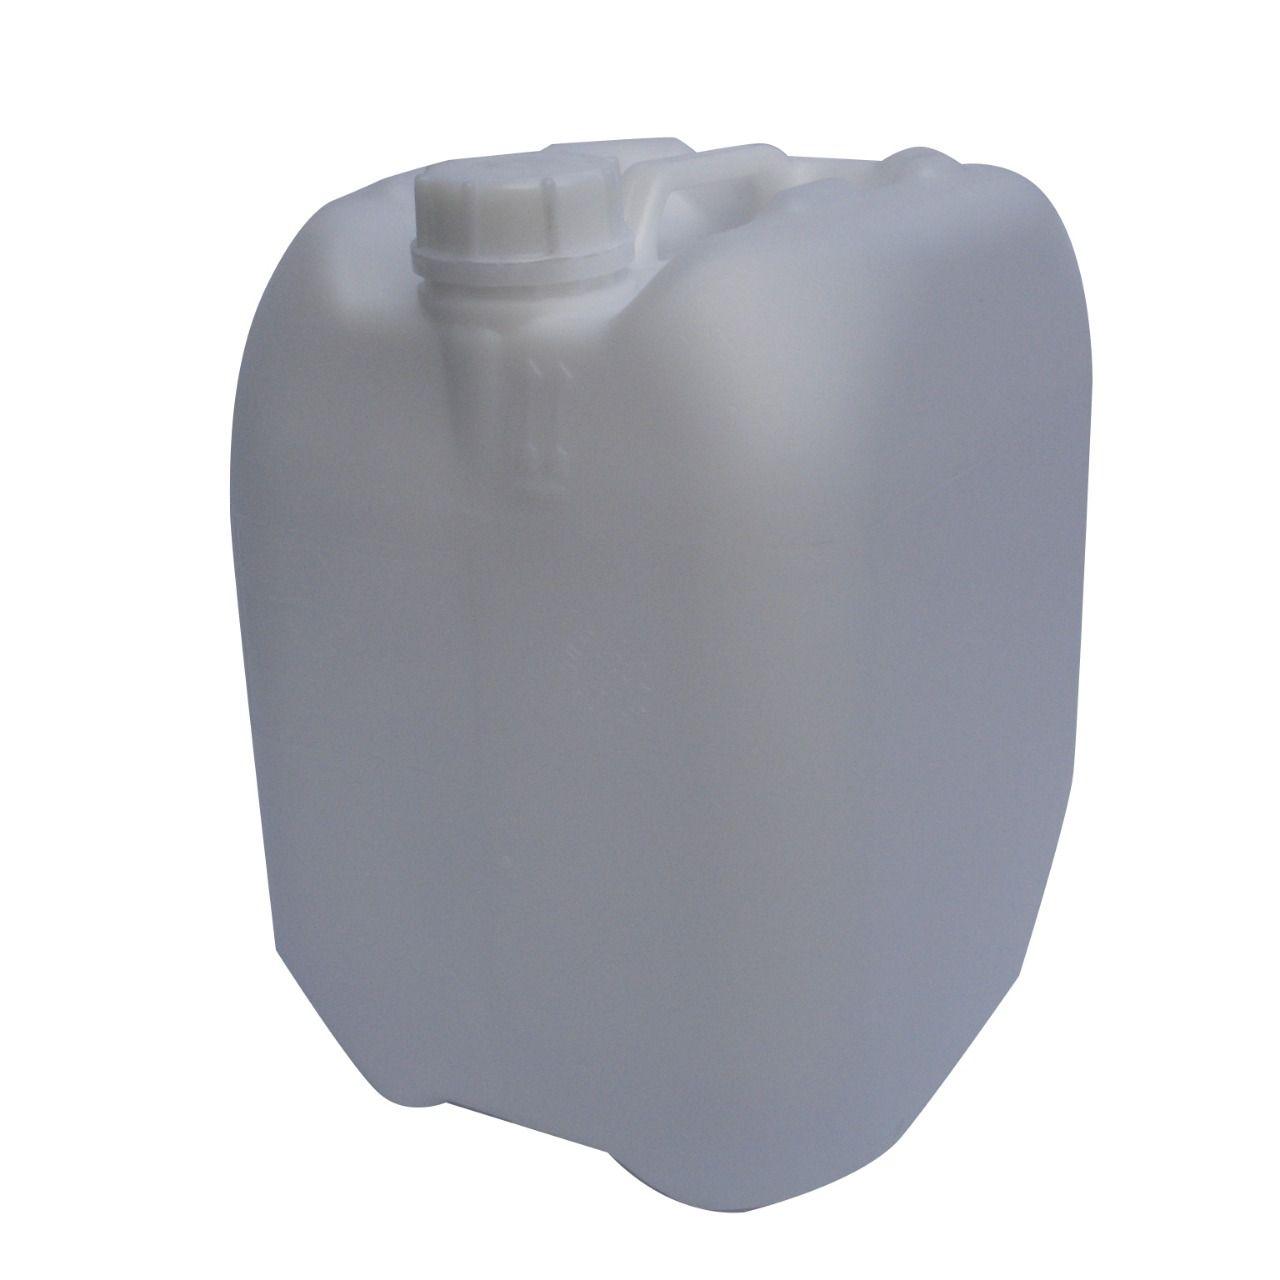 Bombona TF 20 litros - Certificado pelo INMETRO  - WebPlástico